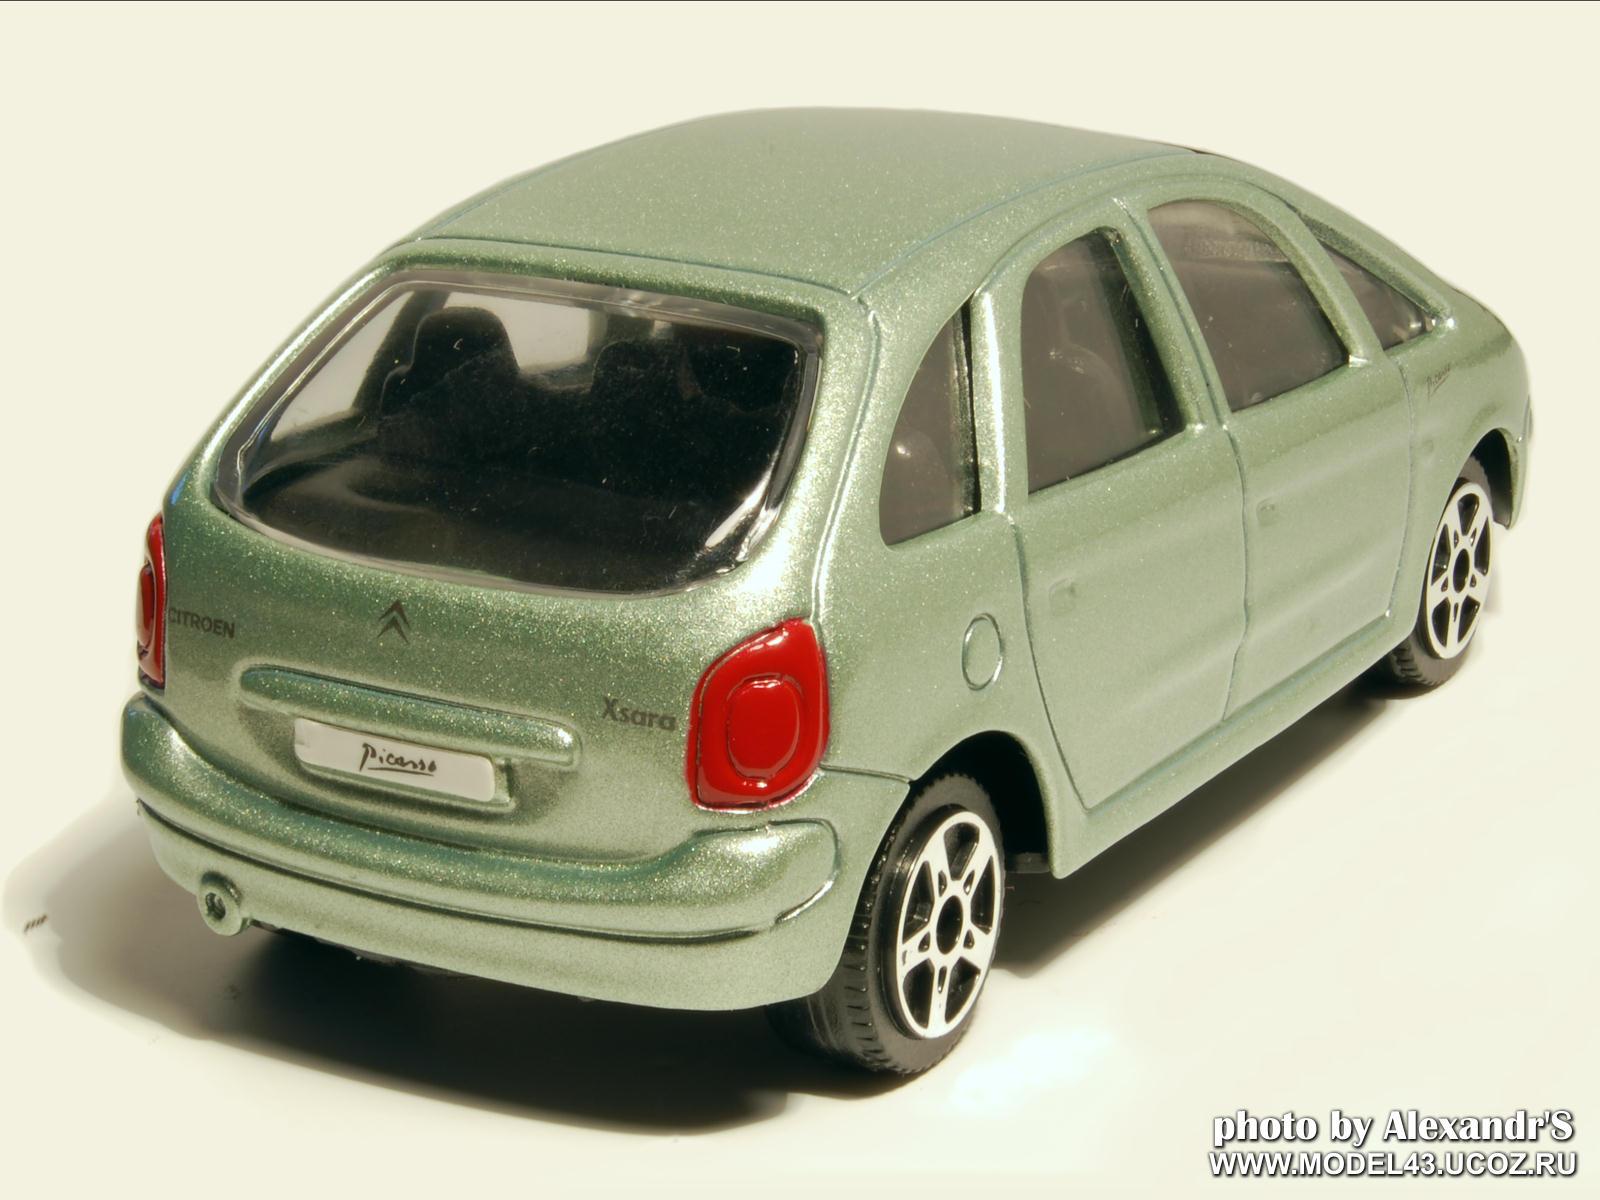 maisto 1999 citroen xsara picasso green metallic in 1. Black Bedroom Furniture Sets. Home Design Ideas